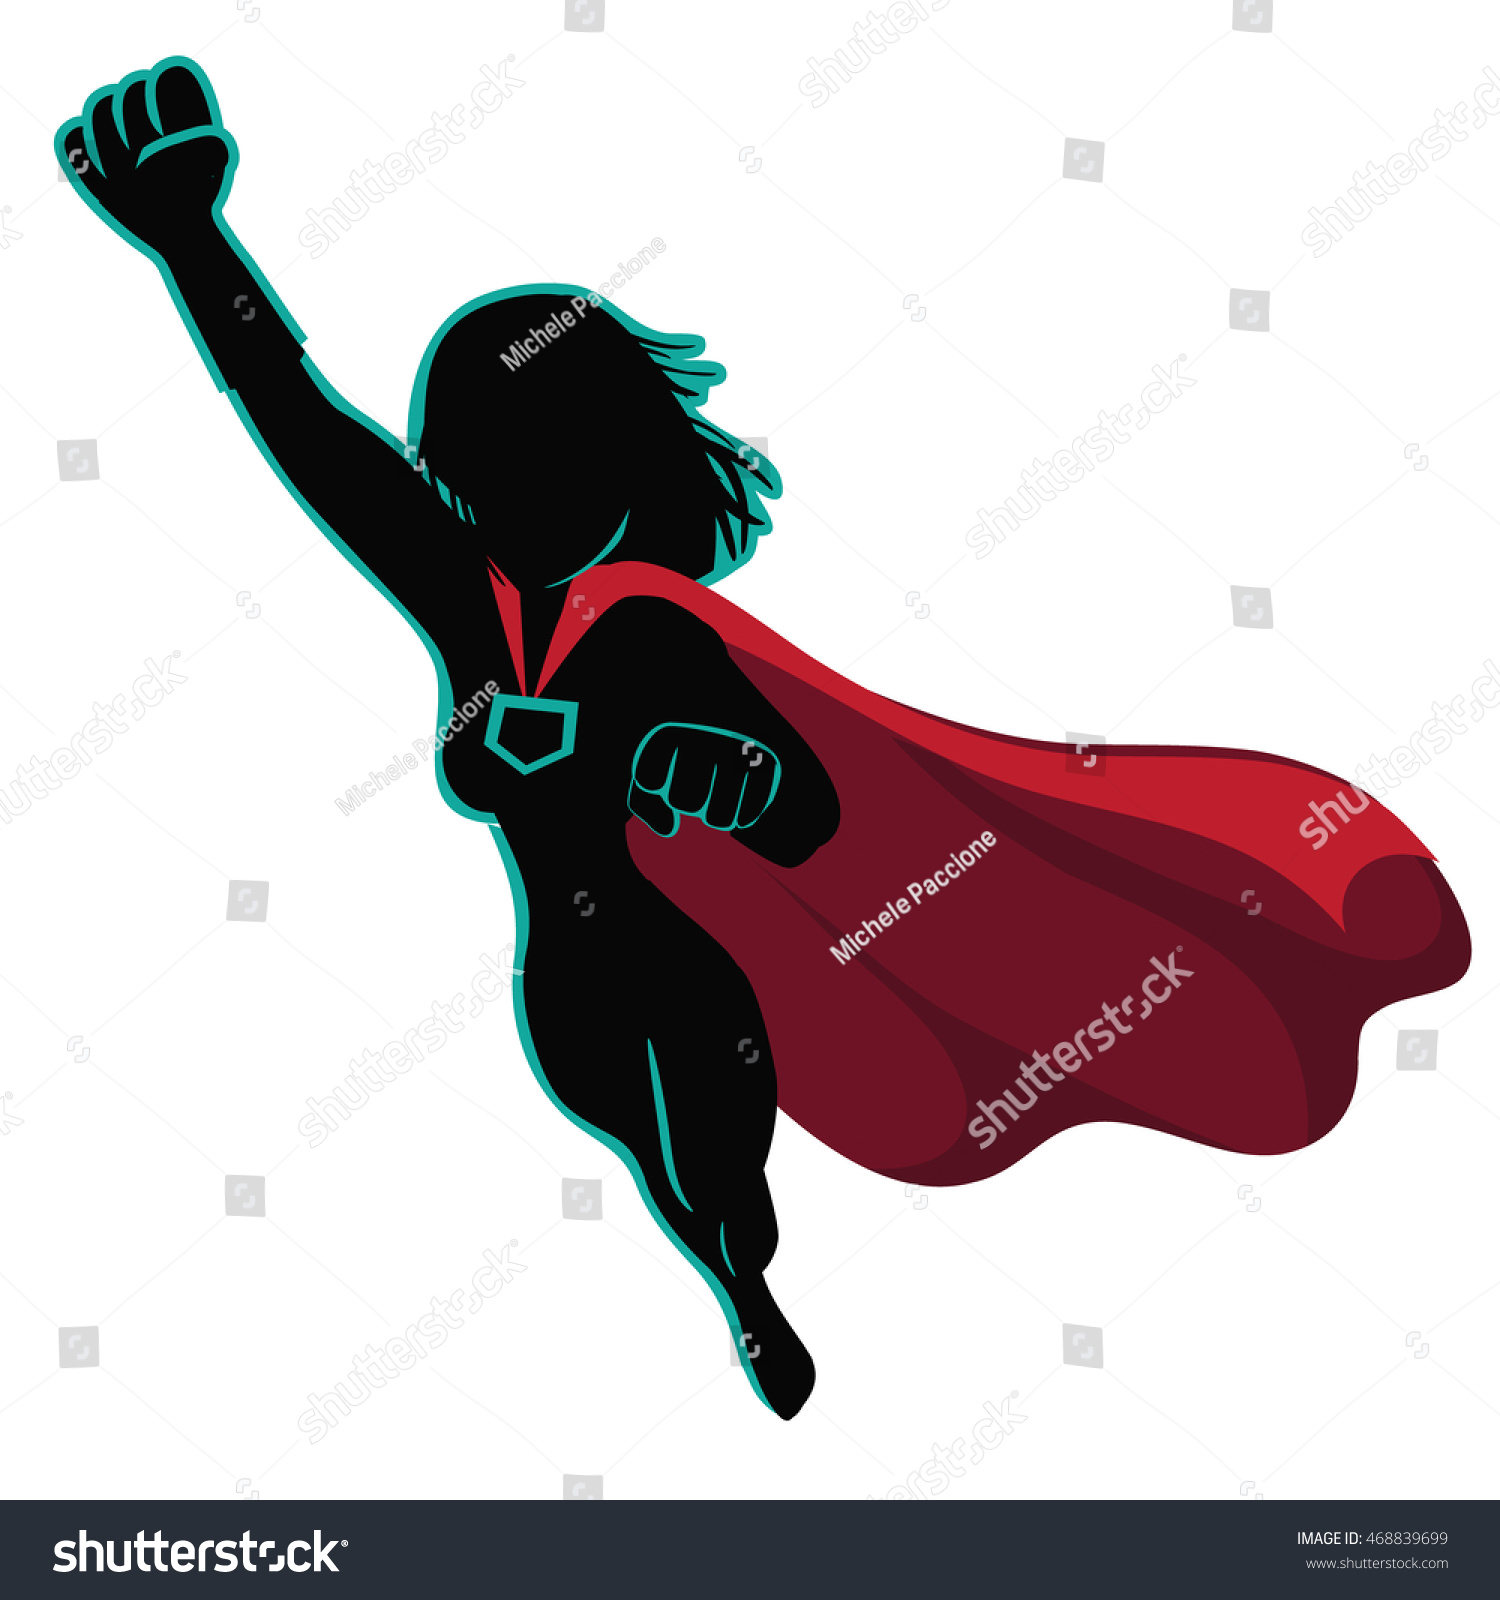 Flying superwoman cartoon character related keywords